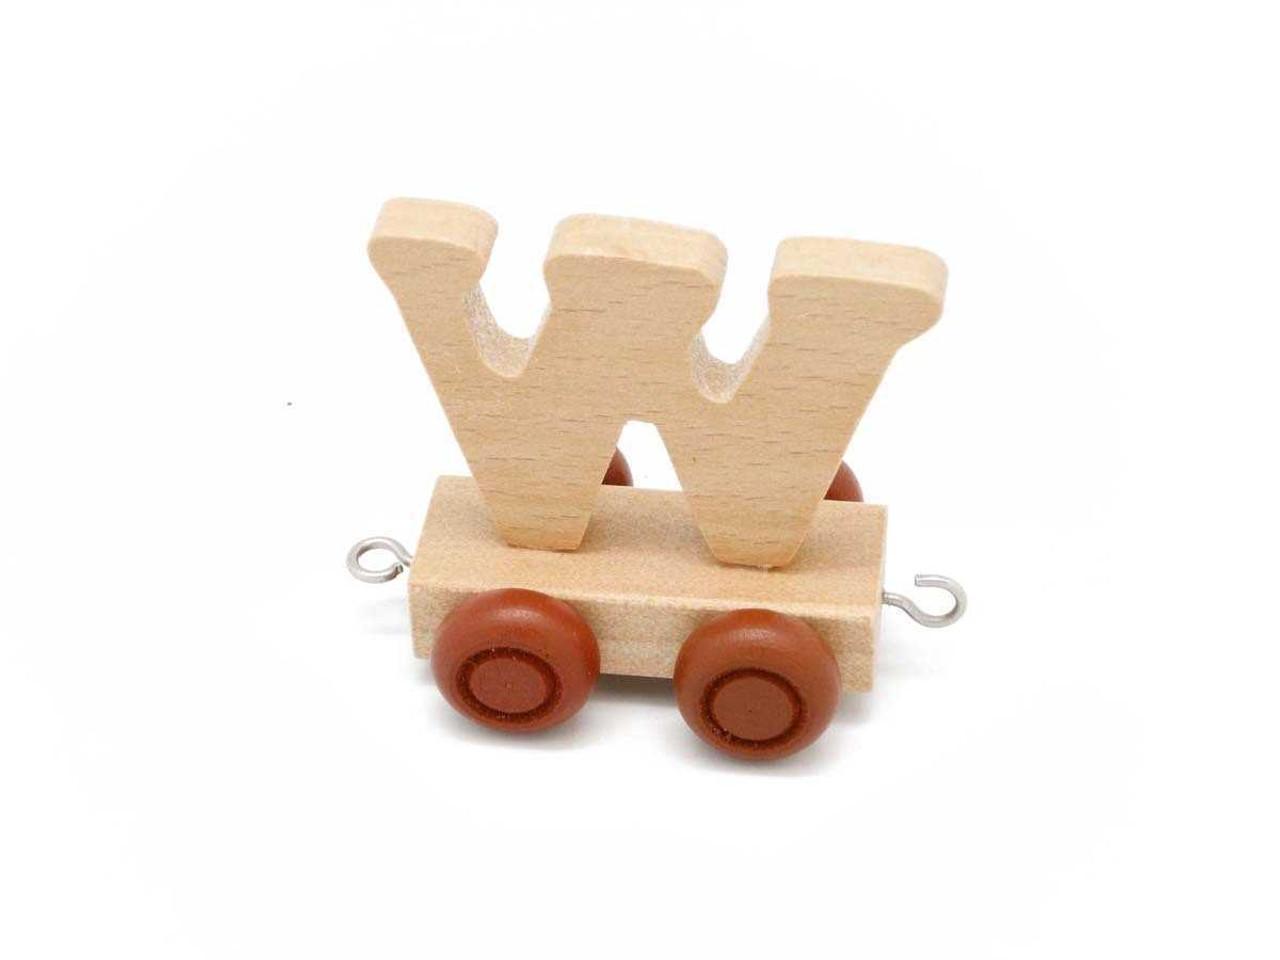 Kaper Kidz Wooden Carriage Letter W